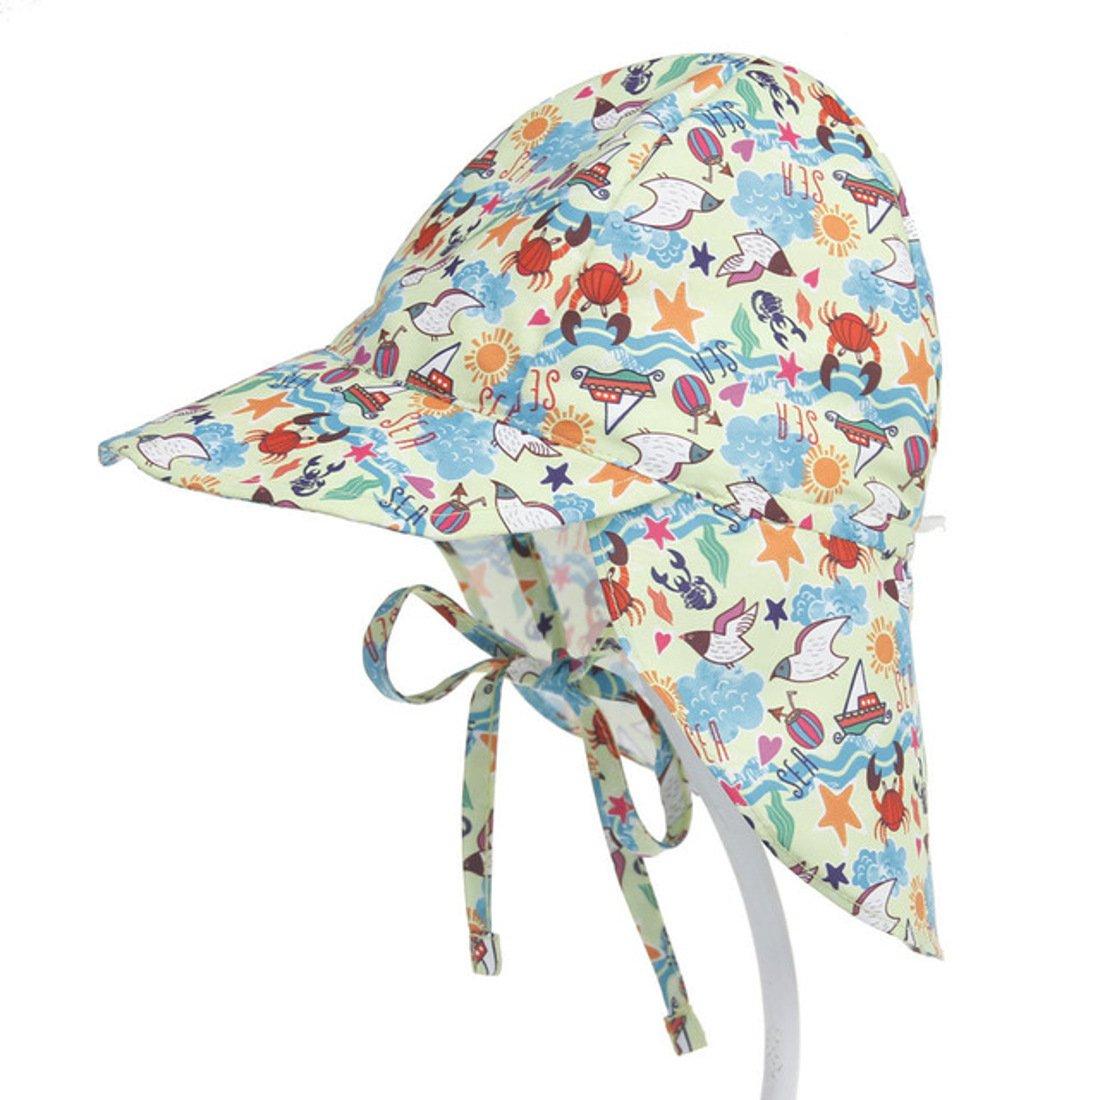 Baby Girls Boys Cotton Neck Sun Protection Flap Legionnaires Summer Cap Hat 0-6 Months (Whale & Anchor) Glamour Girlz